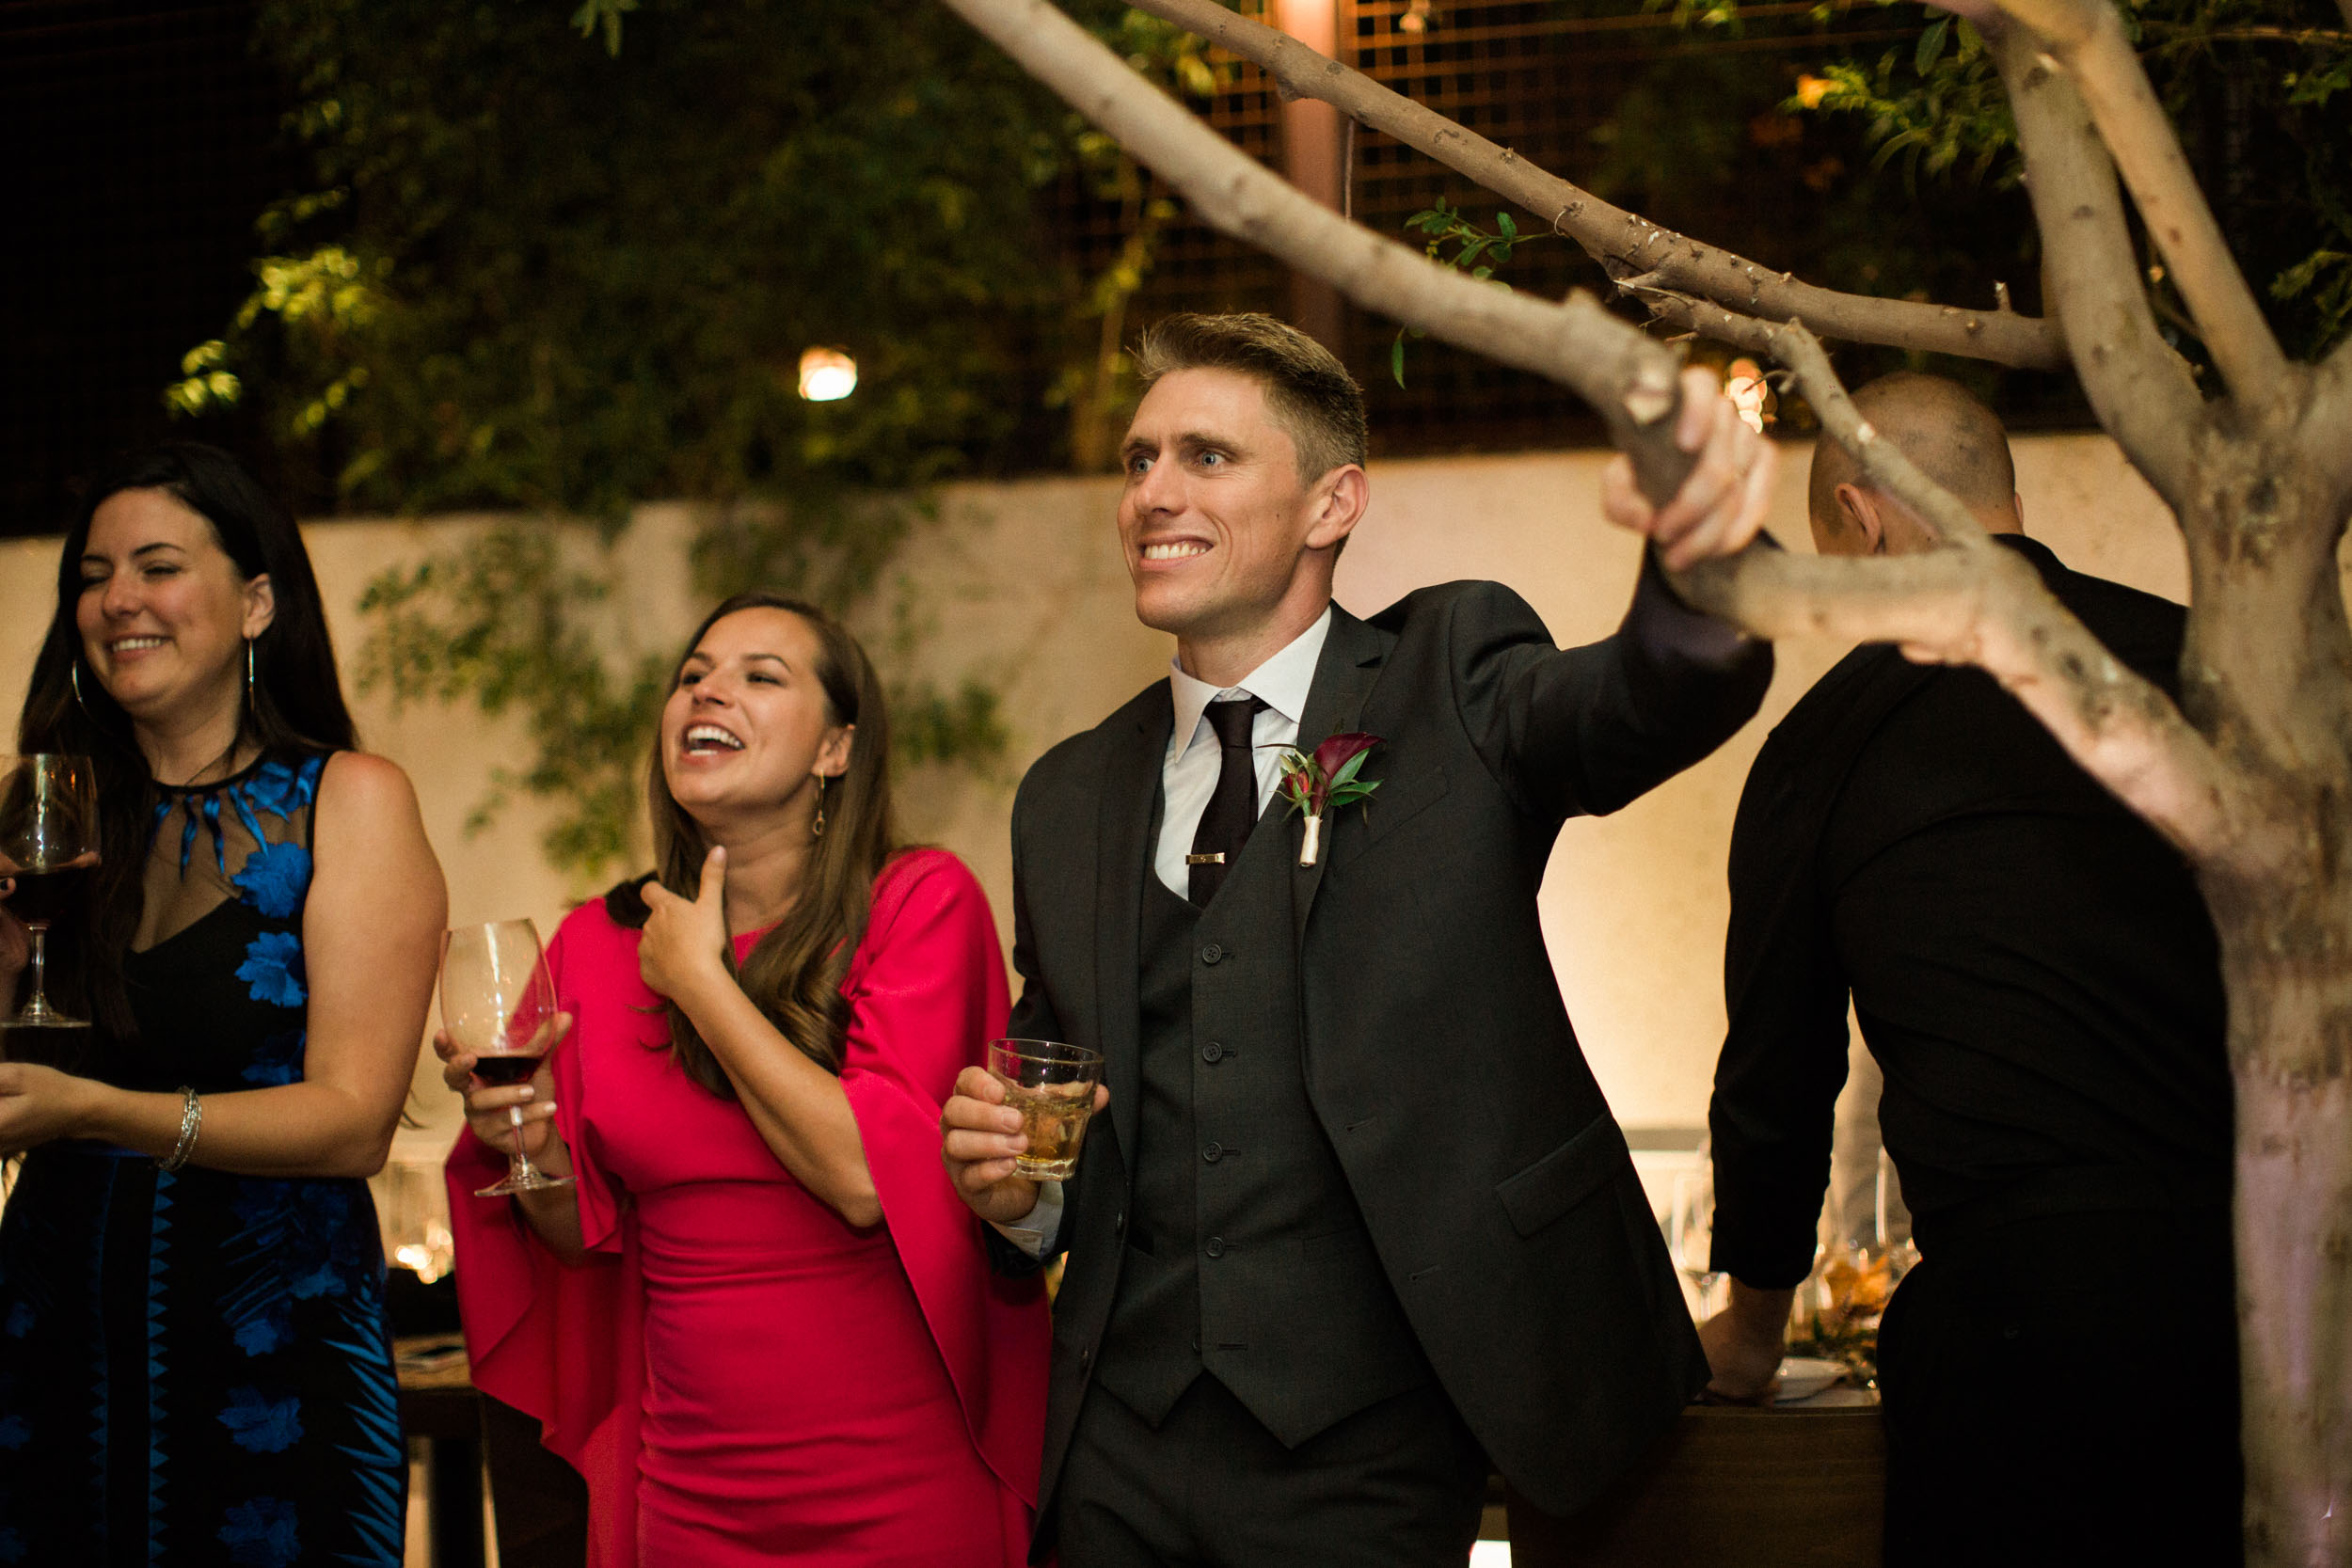 BKM-Photography-Highland-Park-Los-Angeles-Backyard-Wedding-0088.jpg